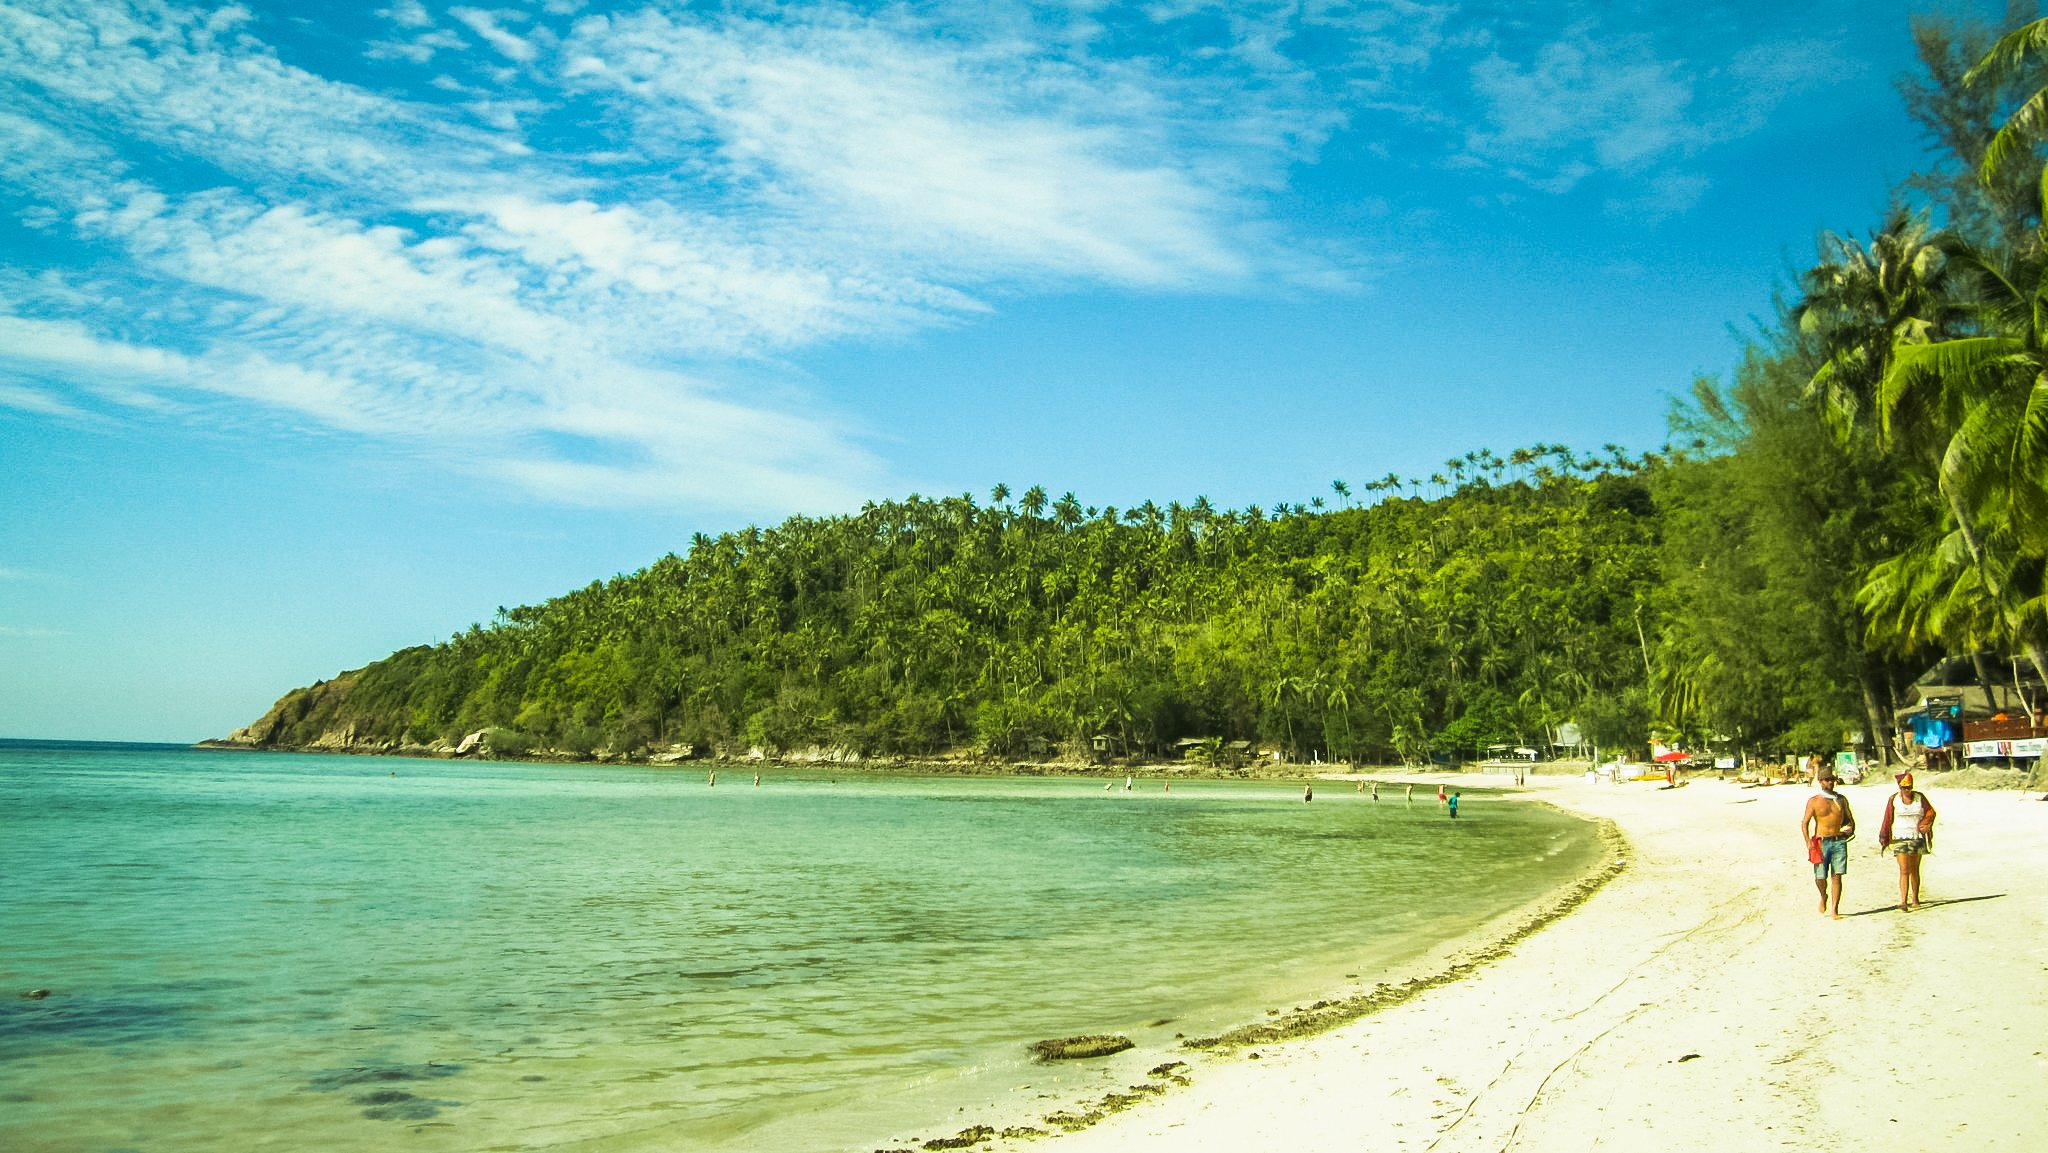 Salad Beach is a secret little haven on Koh Pha Ngan